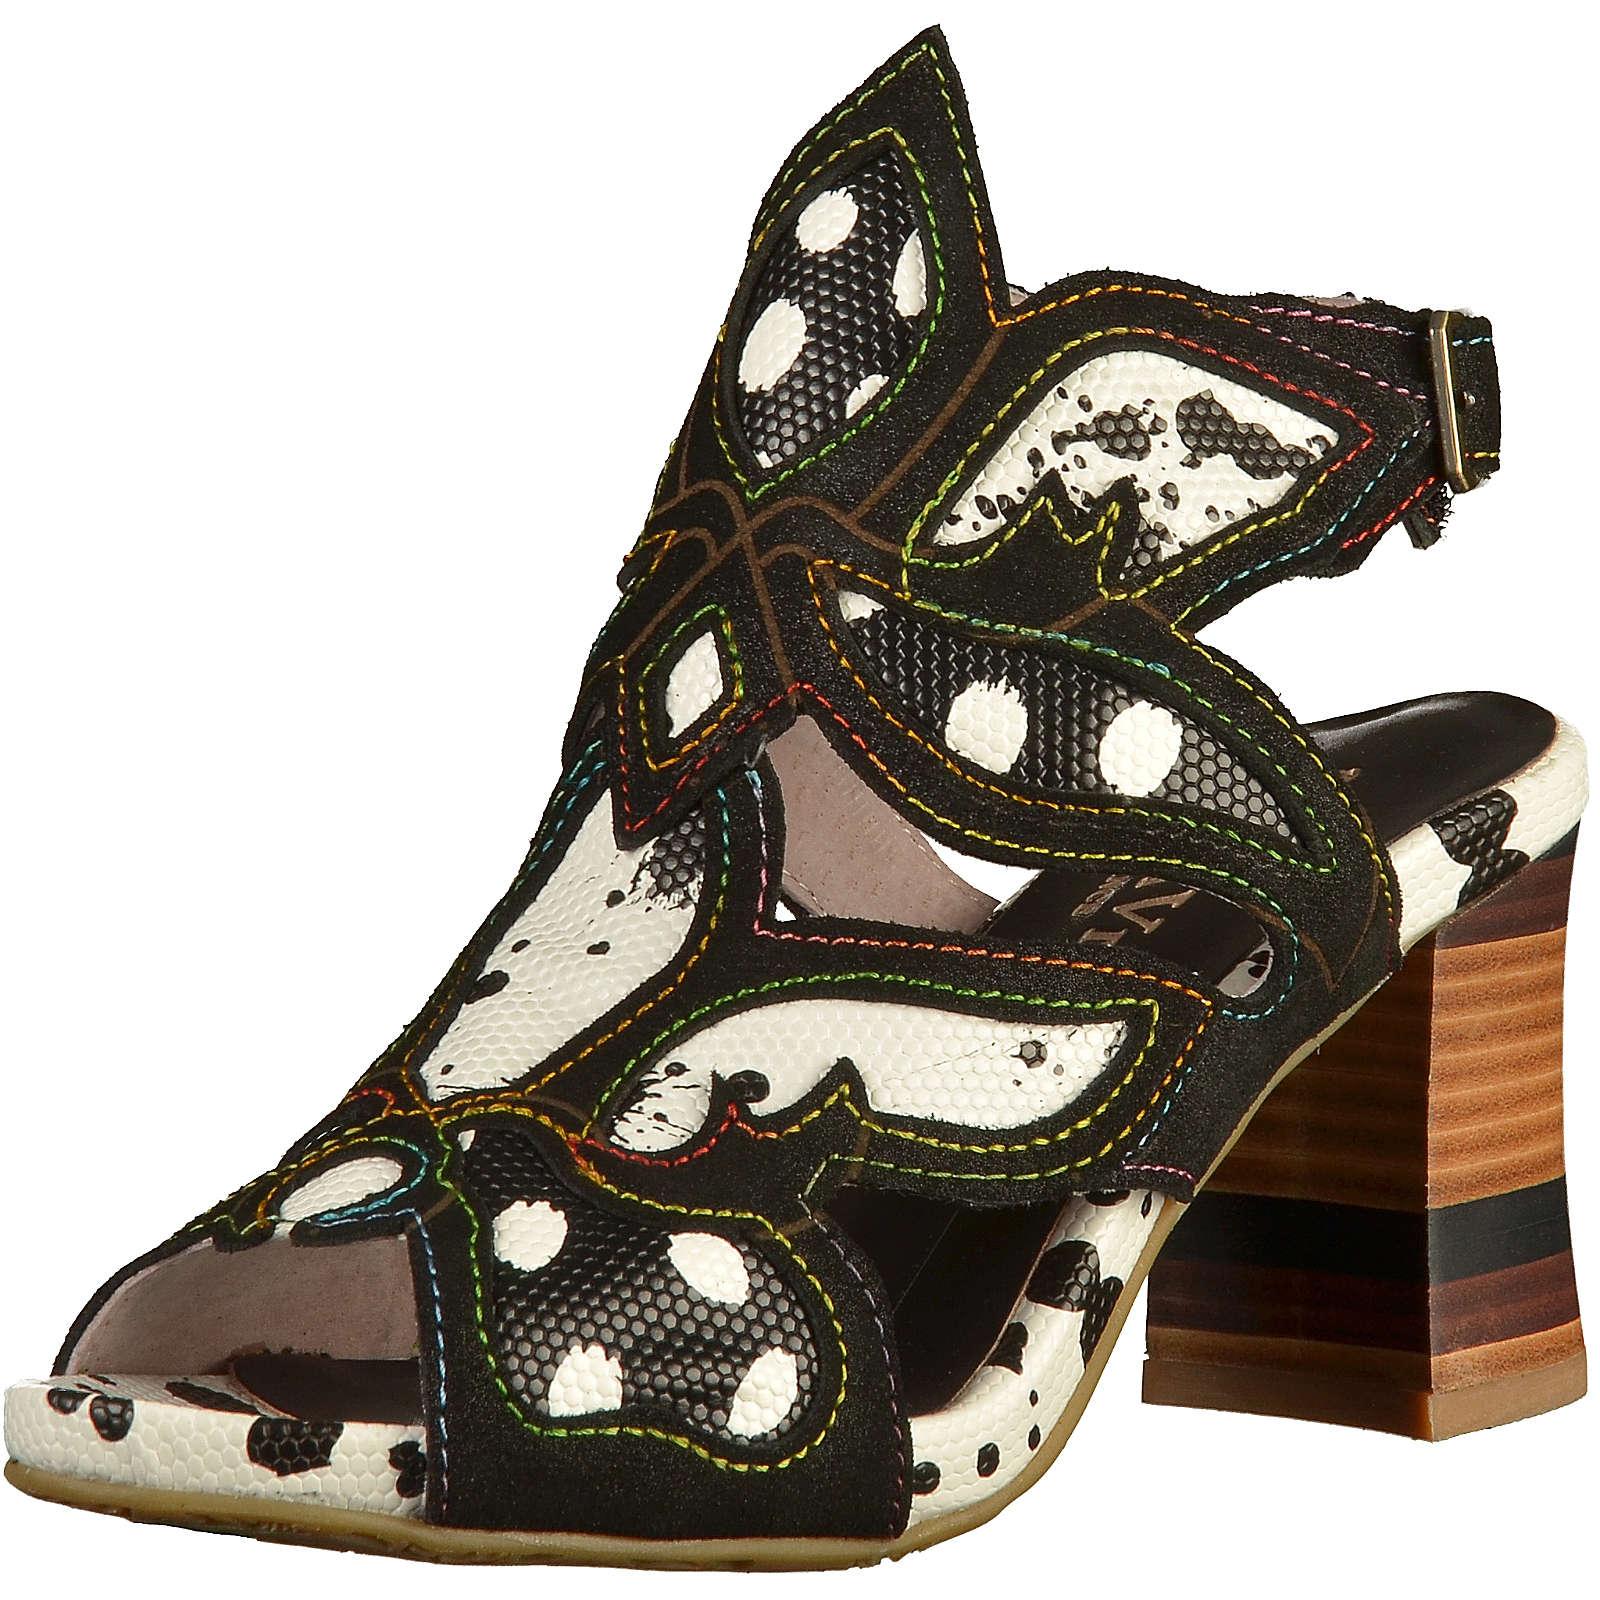 Laura Vita Sandalen Klassische Sandaletten schwarz Damen Gr. 36